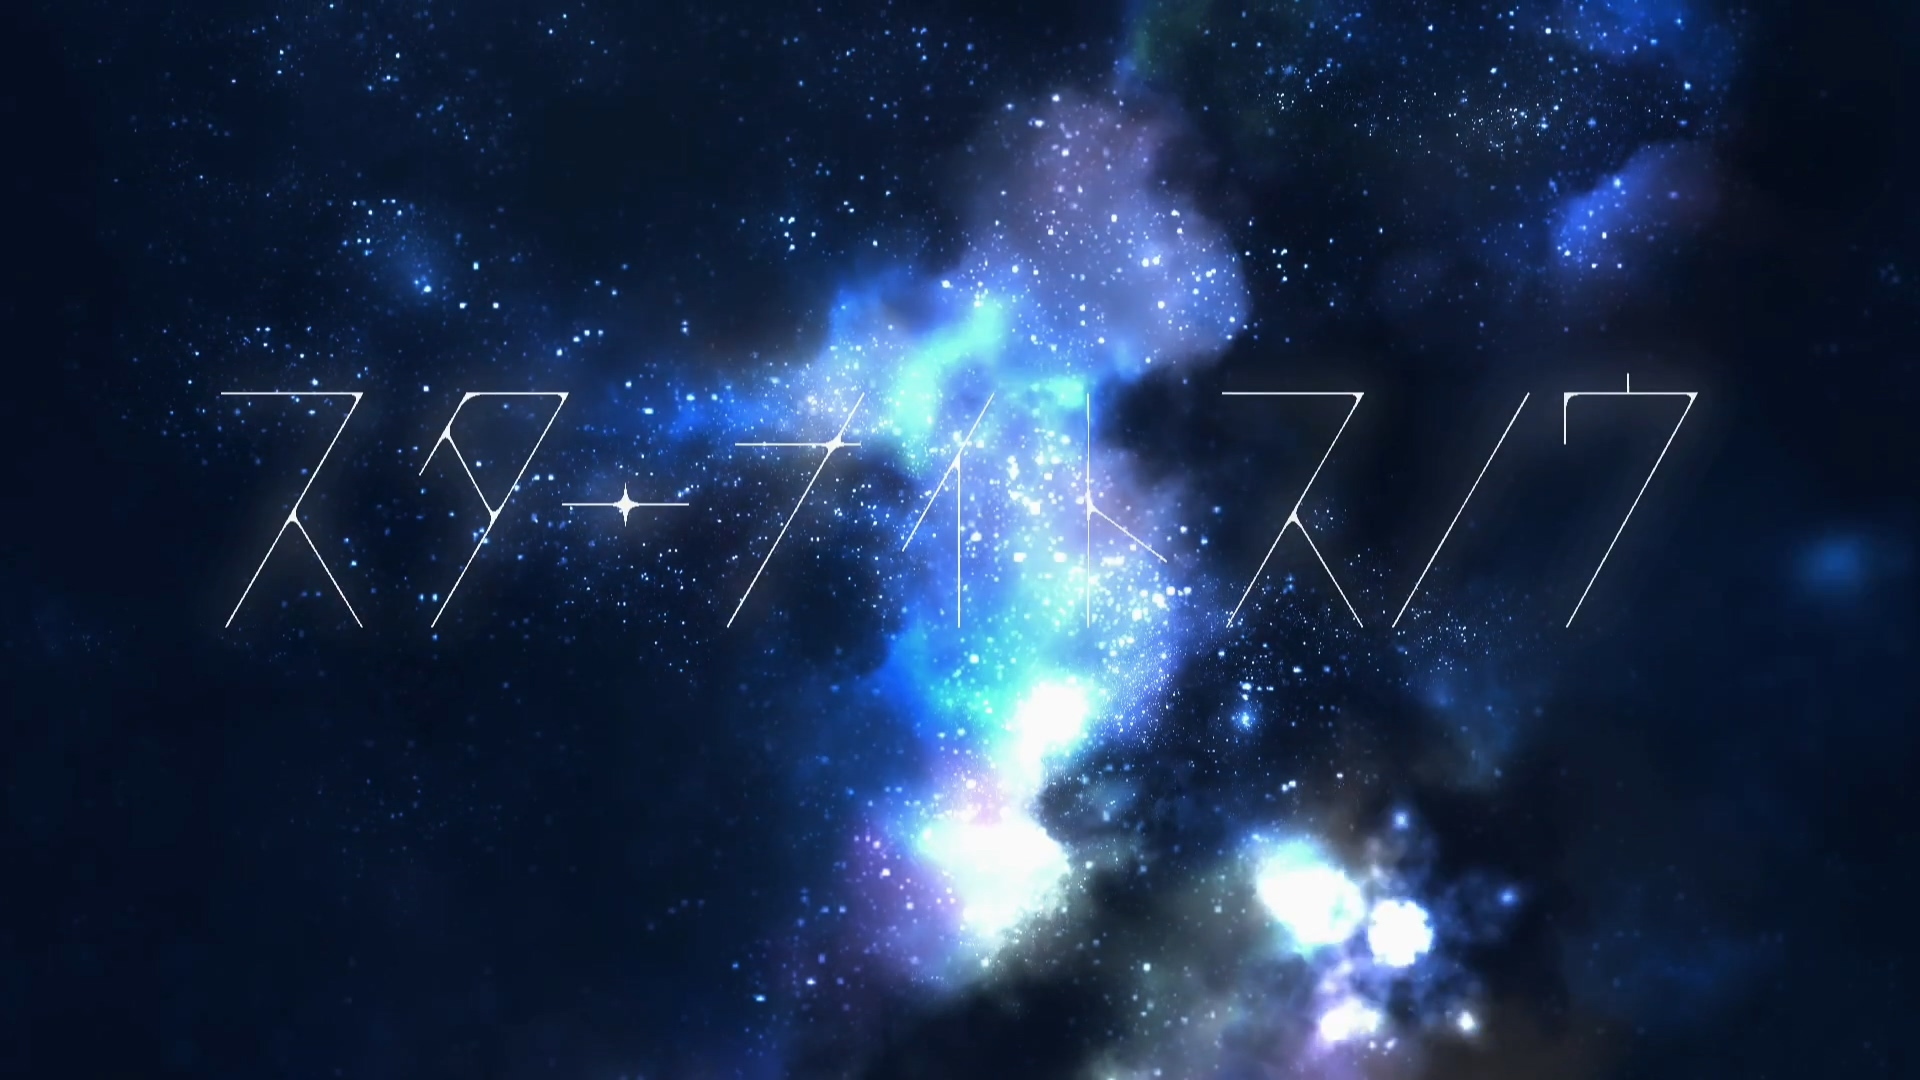 【中文字幕】星夜之雪【n-buna × Orangestar feat .初音ミク】